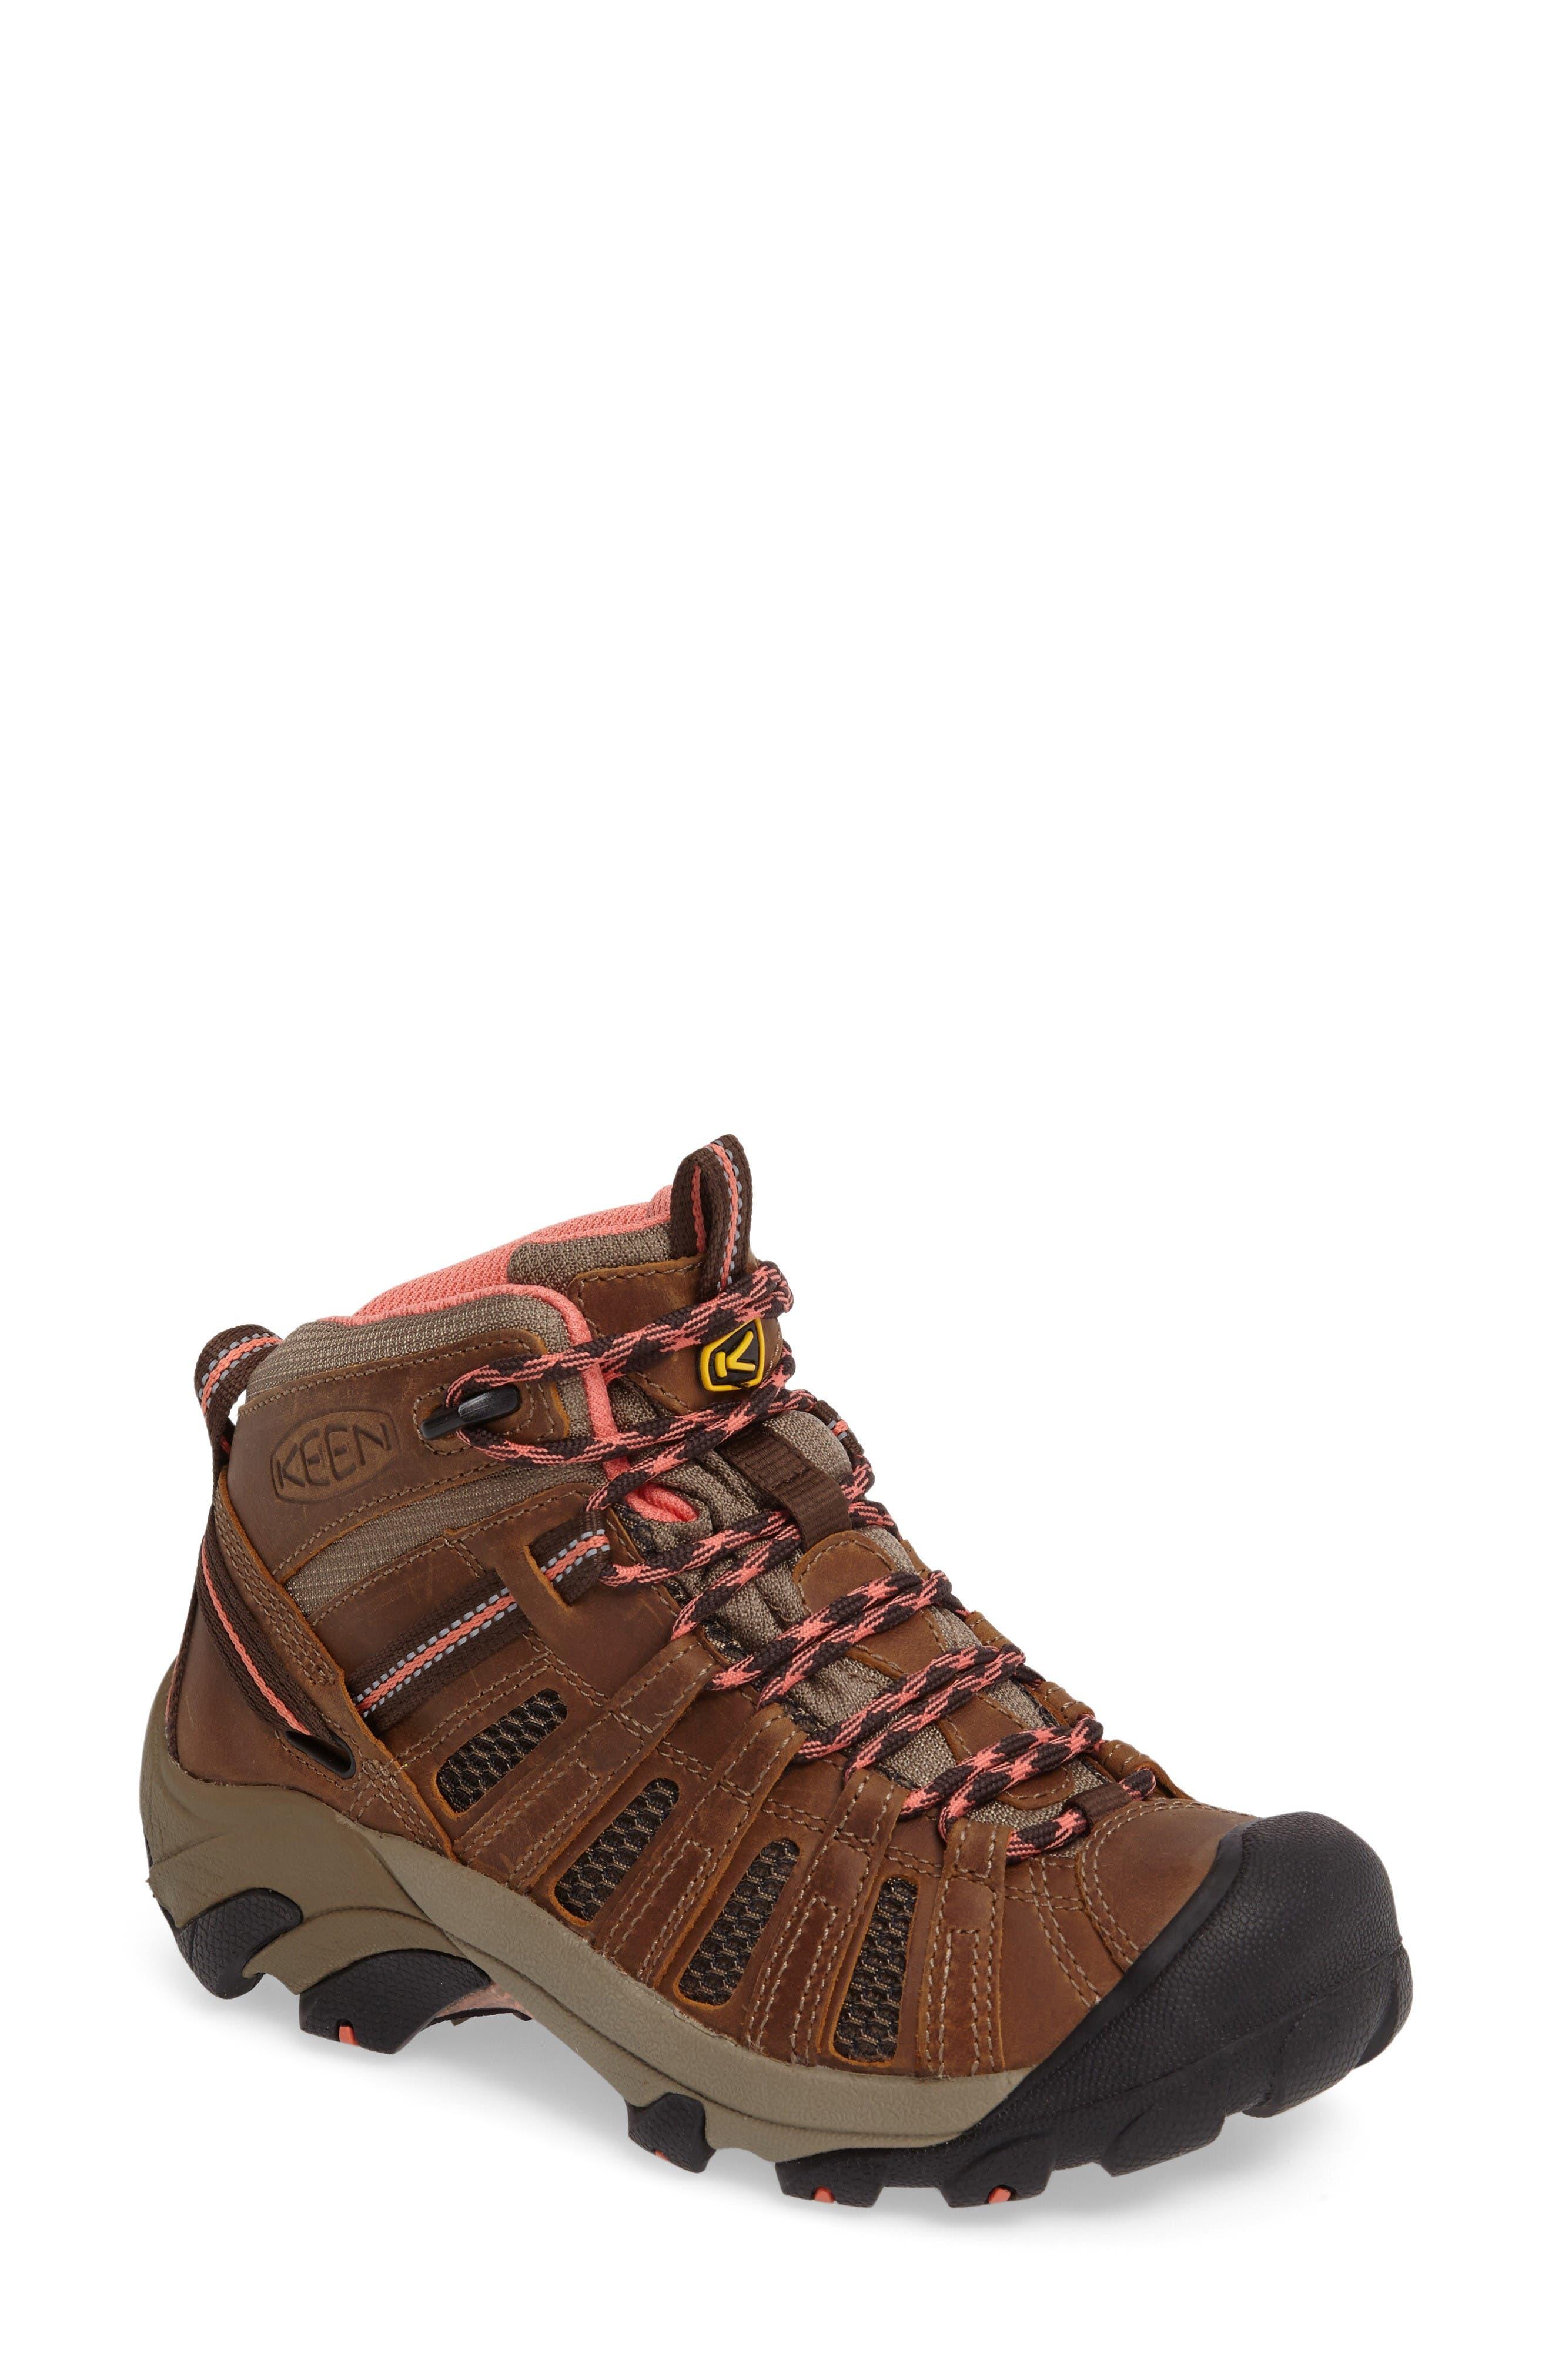 Main Image - Keen 'Voyageur Mid' Trail Shoe (Women)